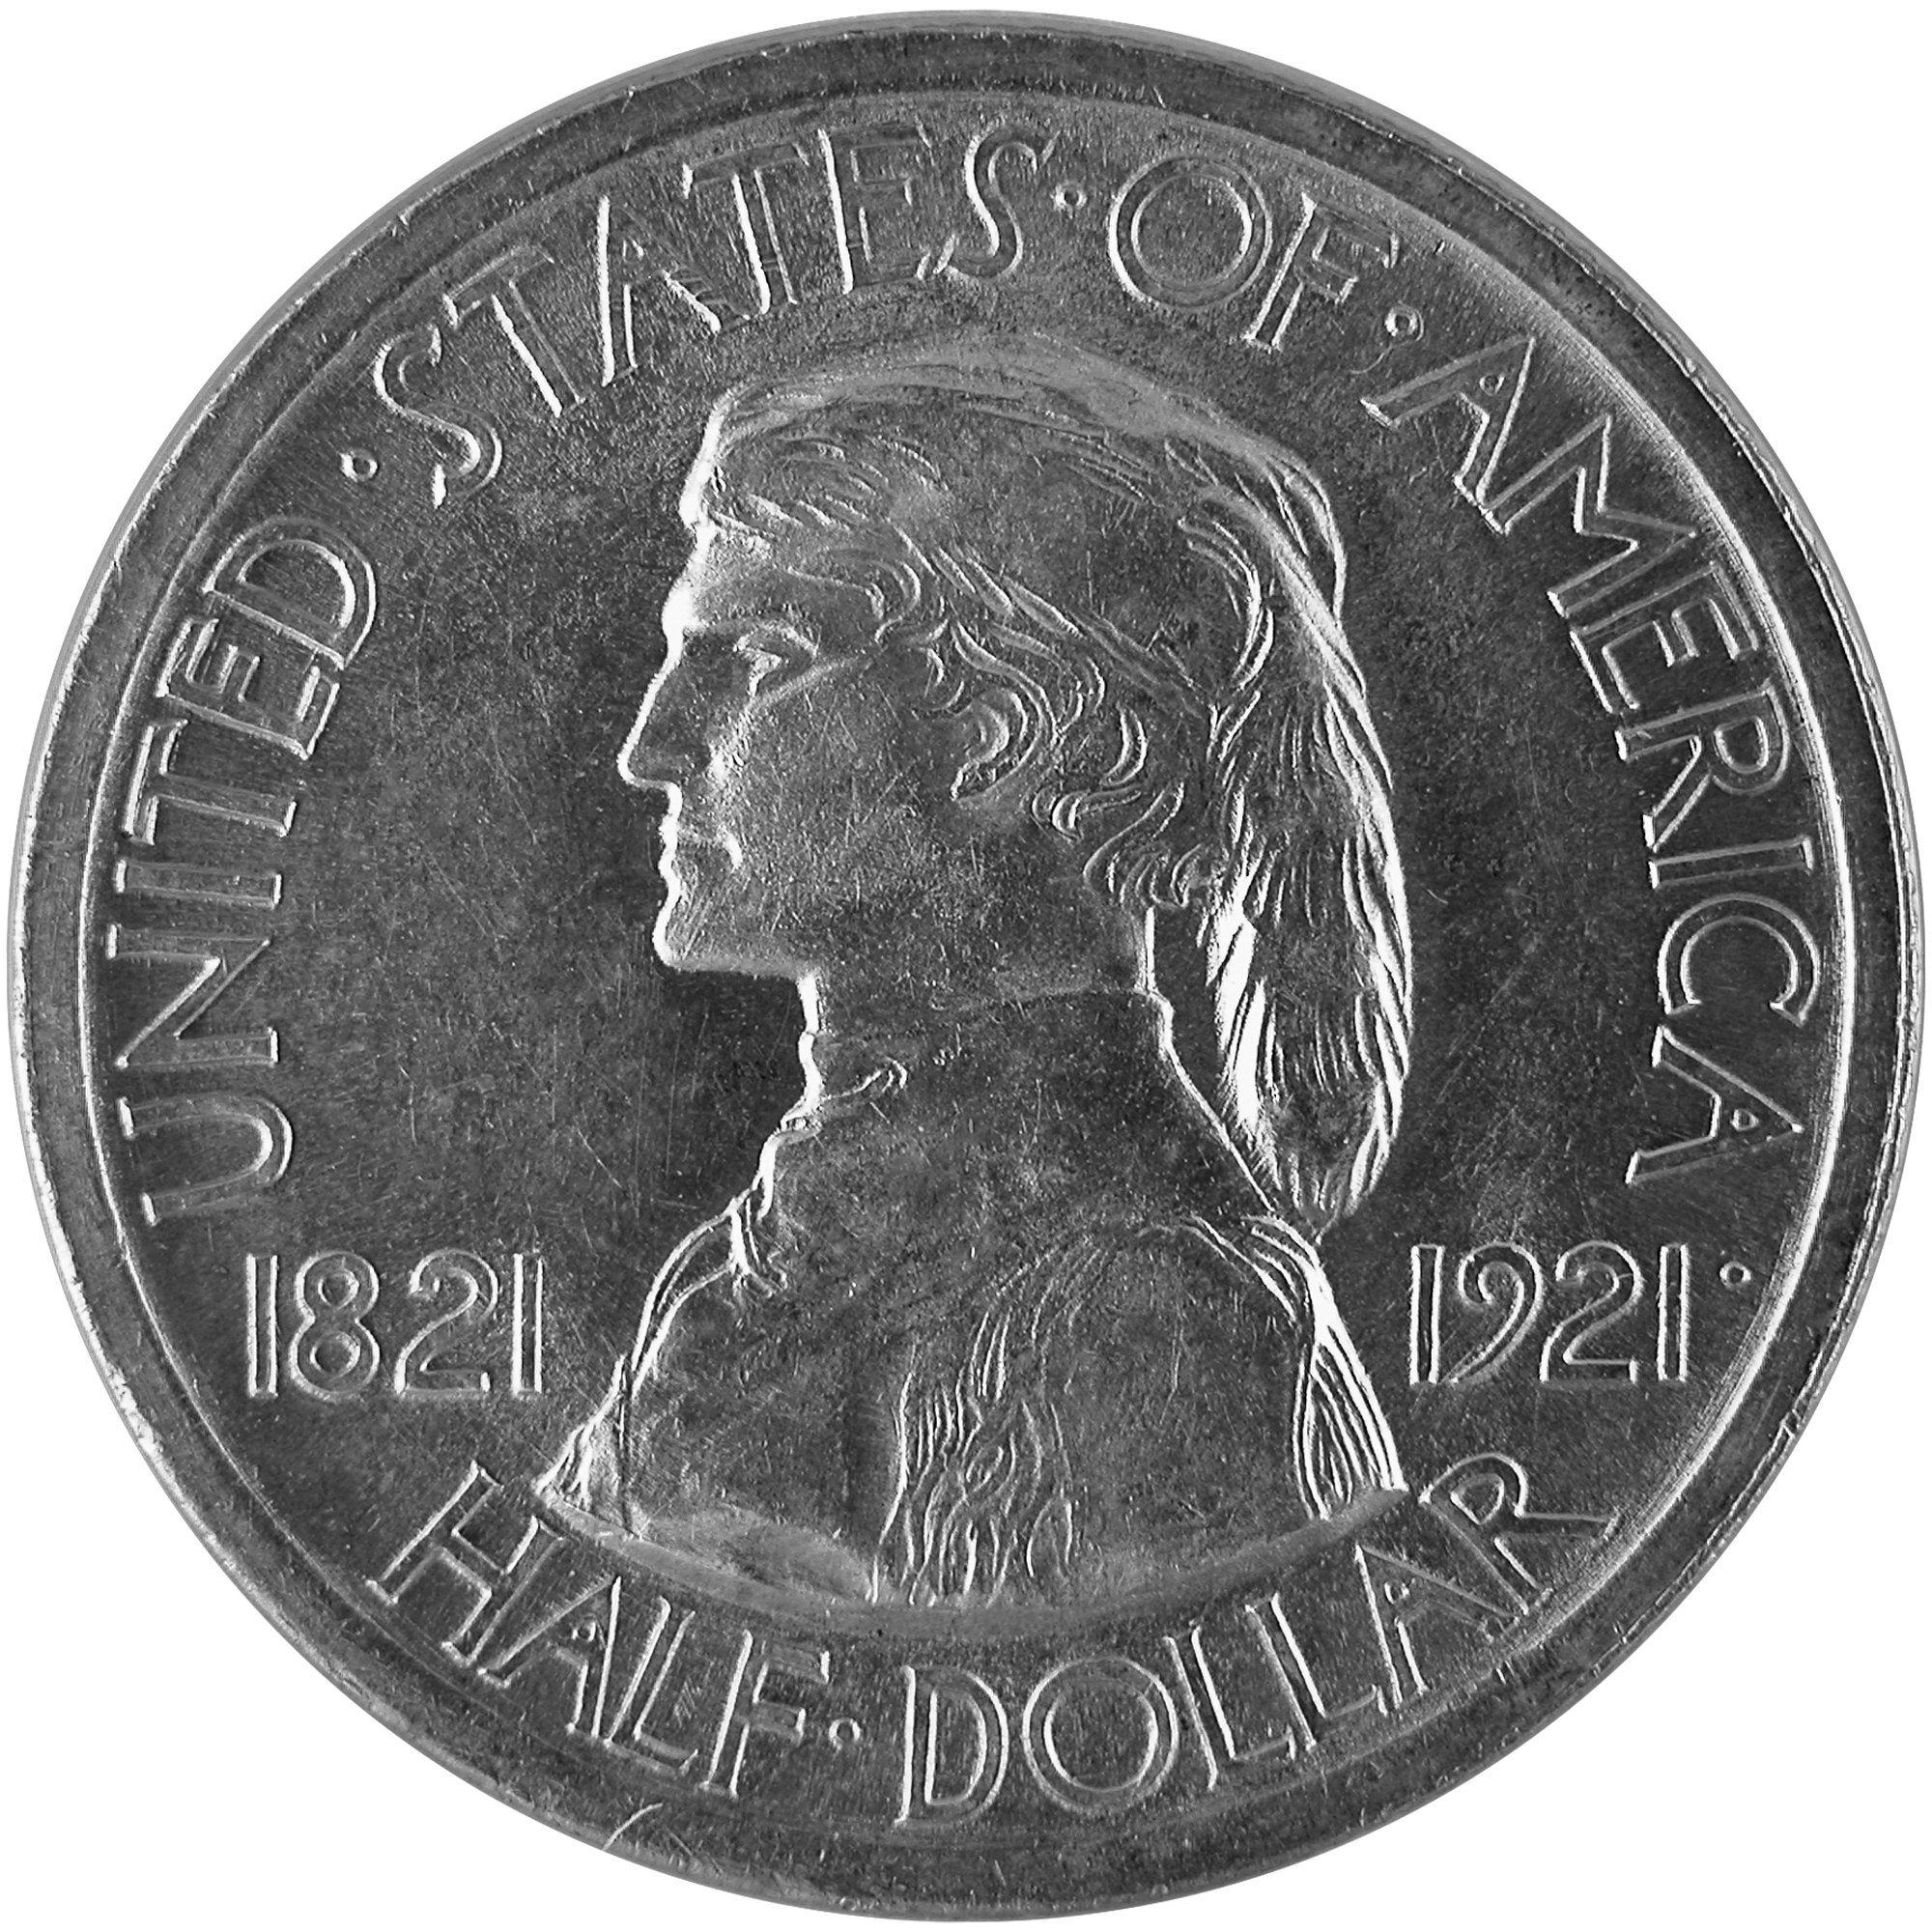 1921 Missouri Centennial Commemorative Silver Half Dollar Coin Obverse